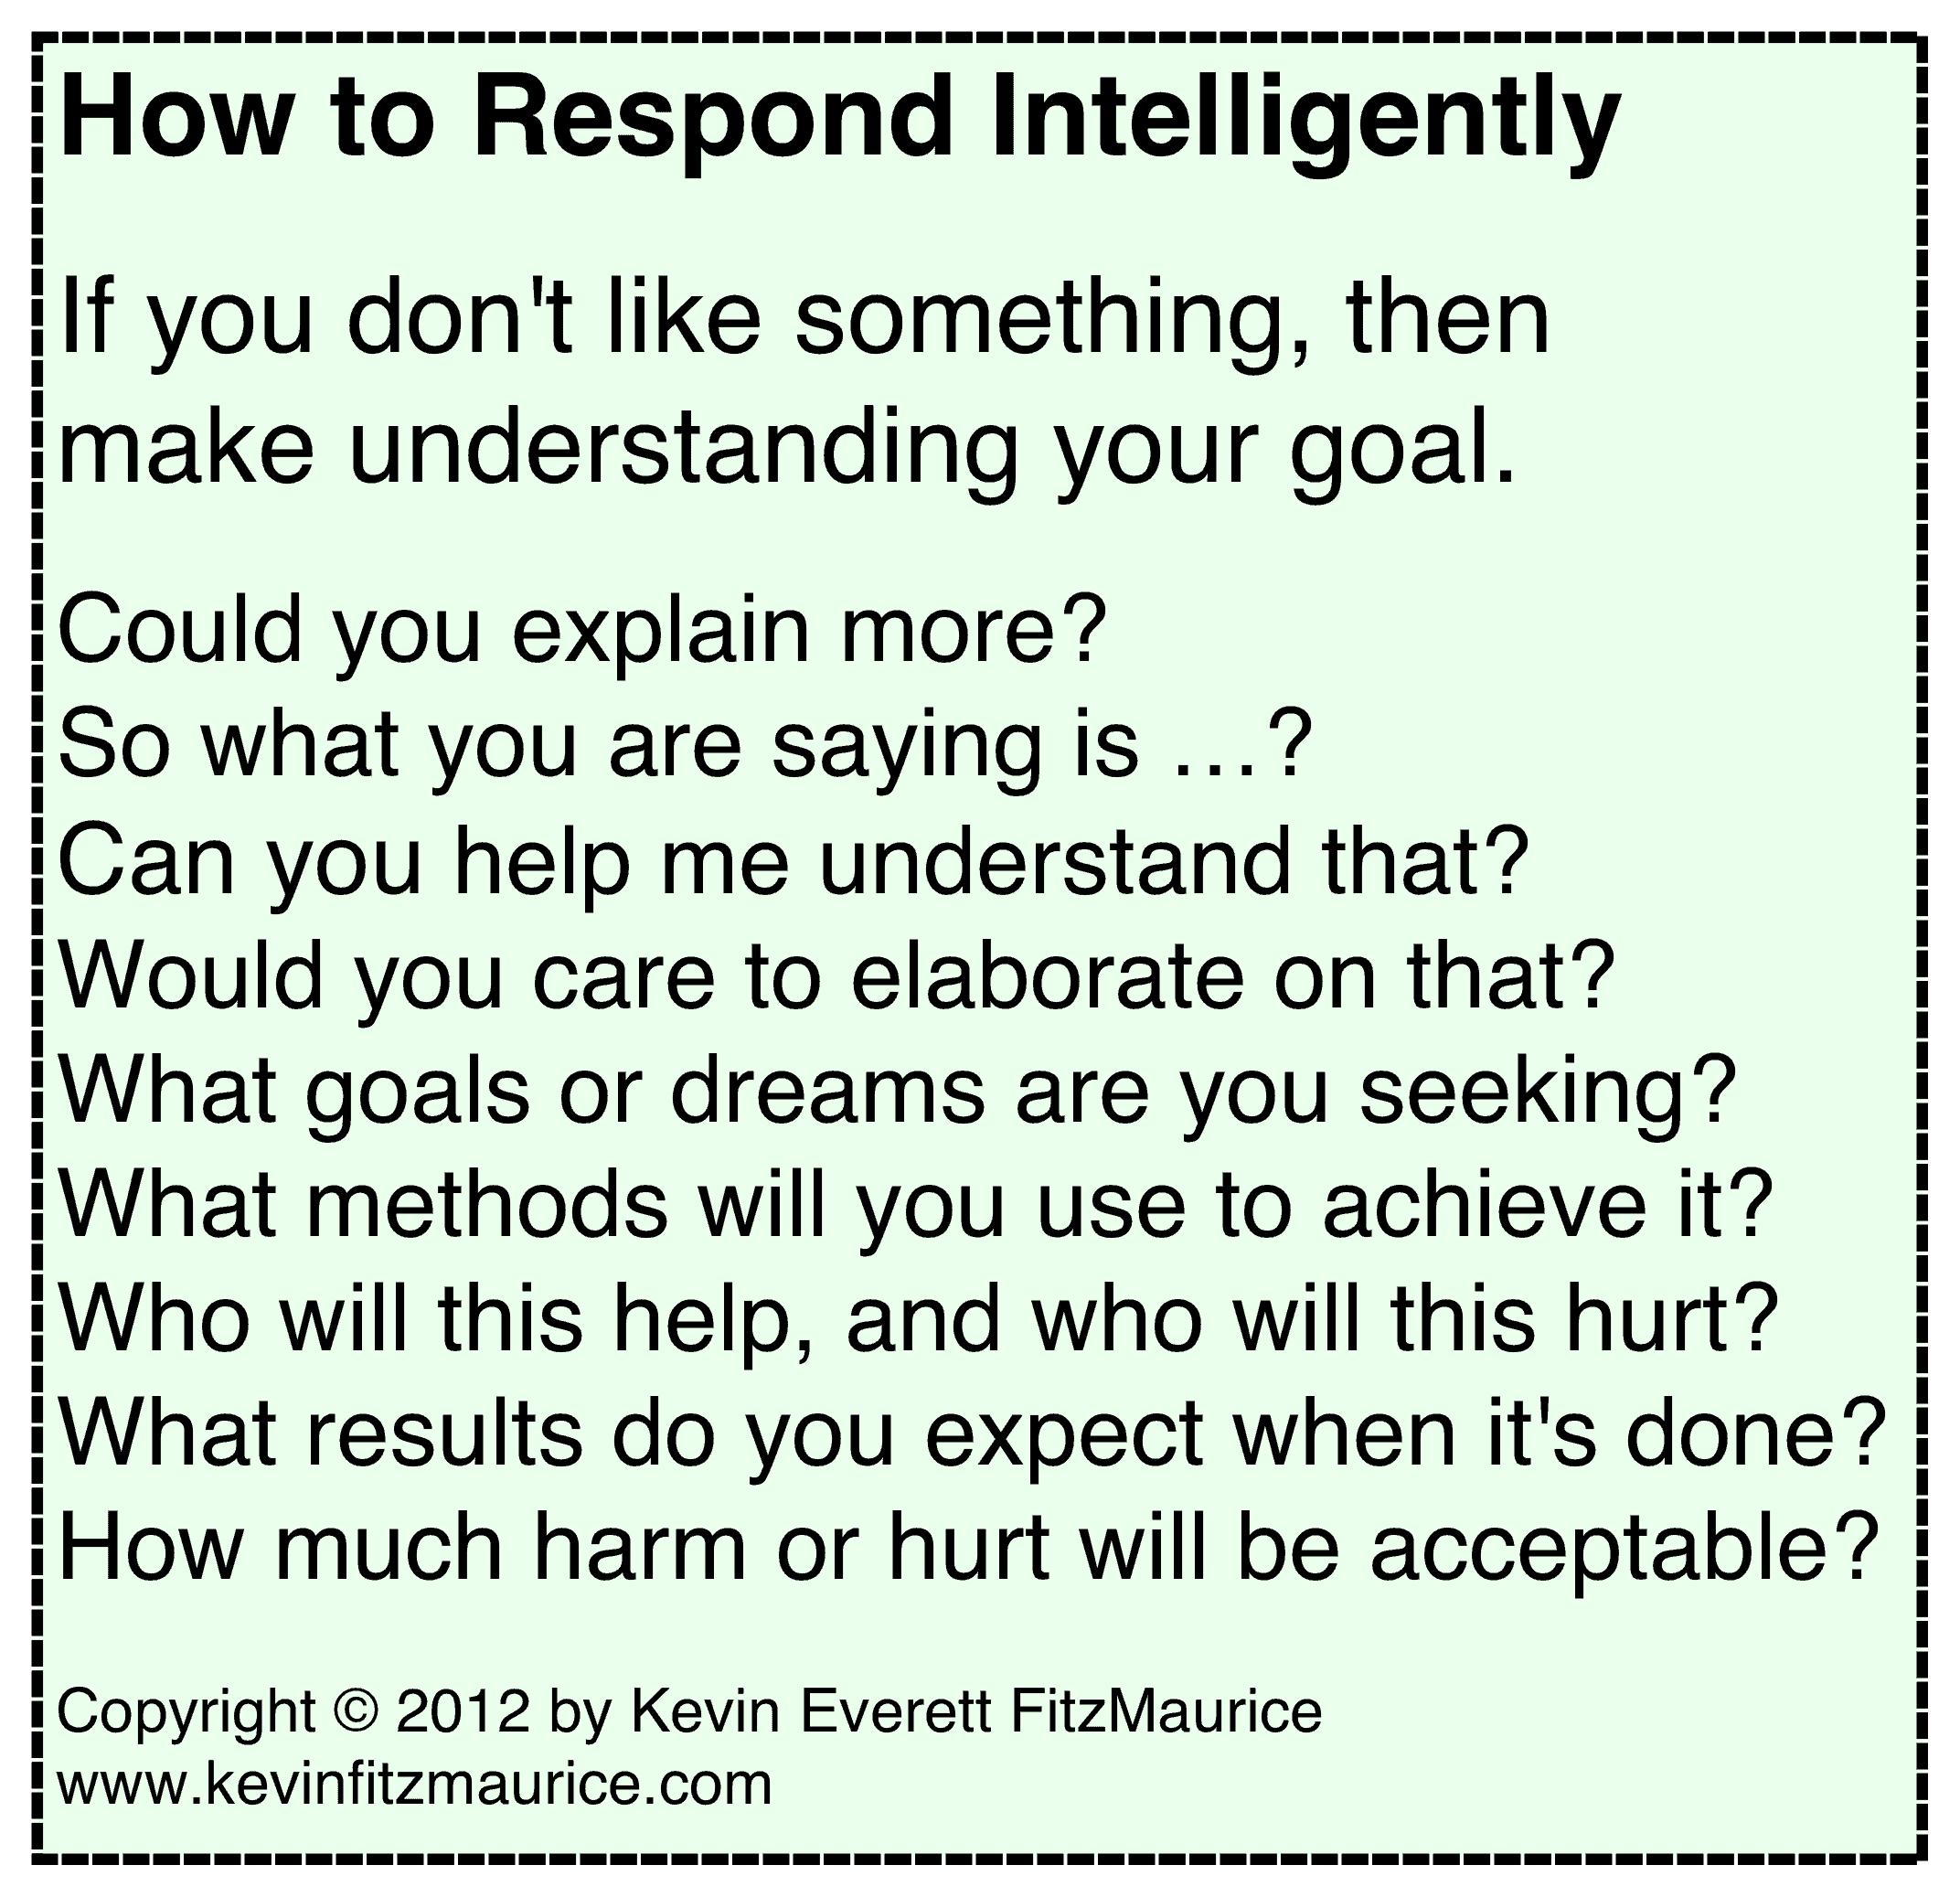 intelligent responding